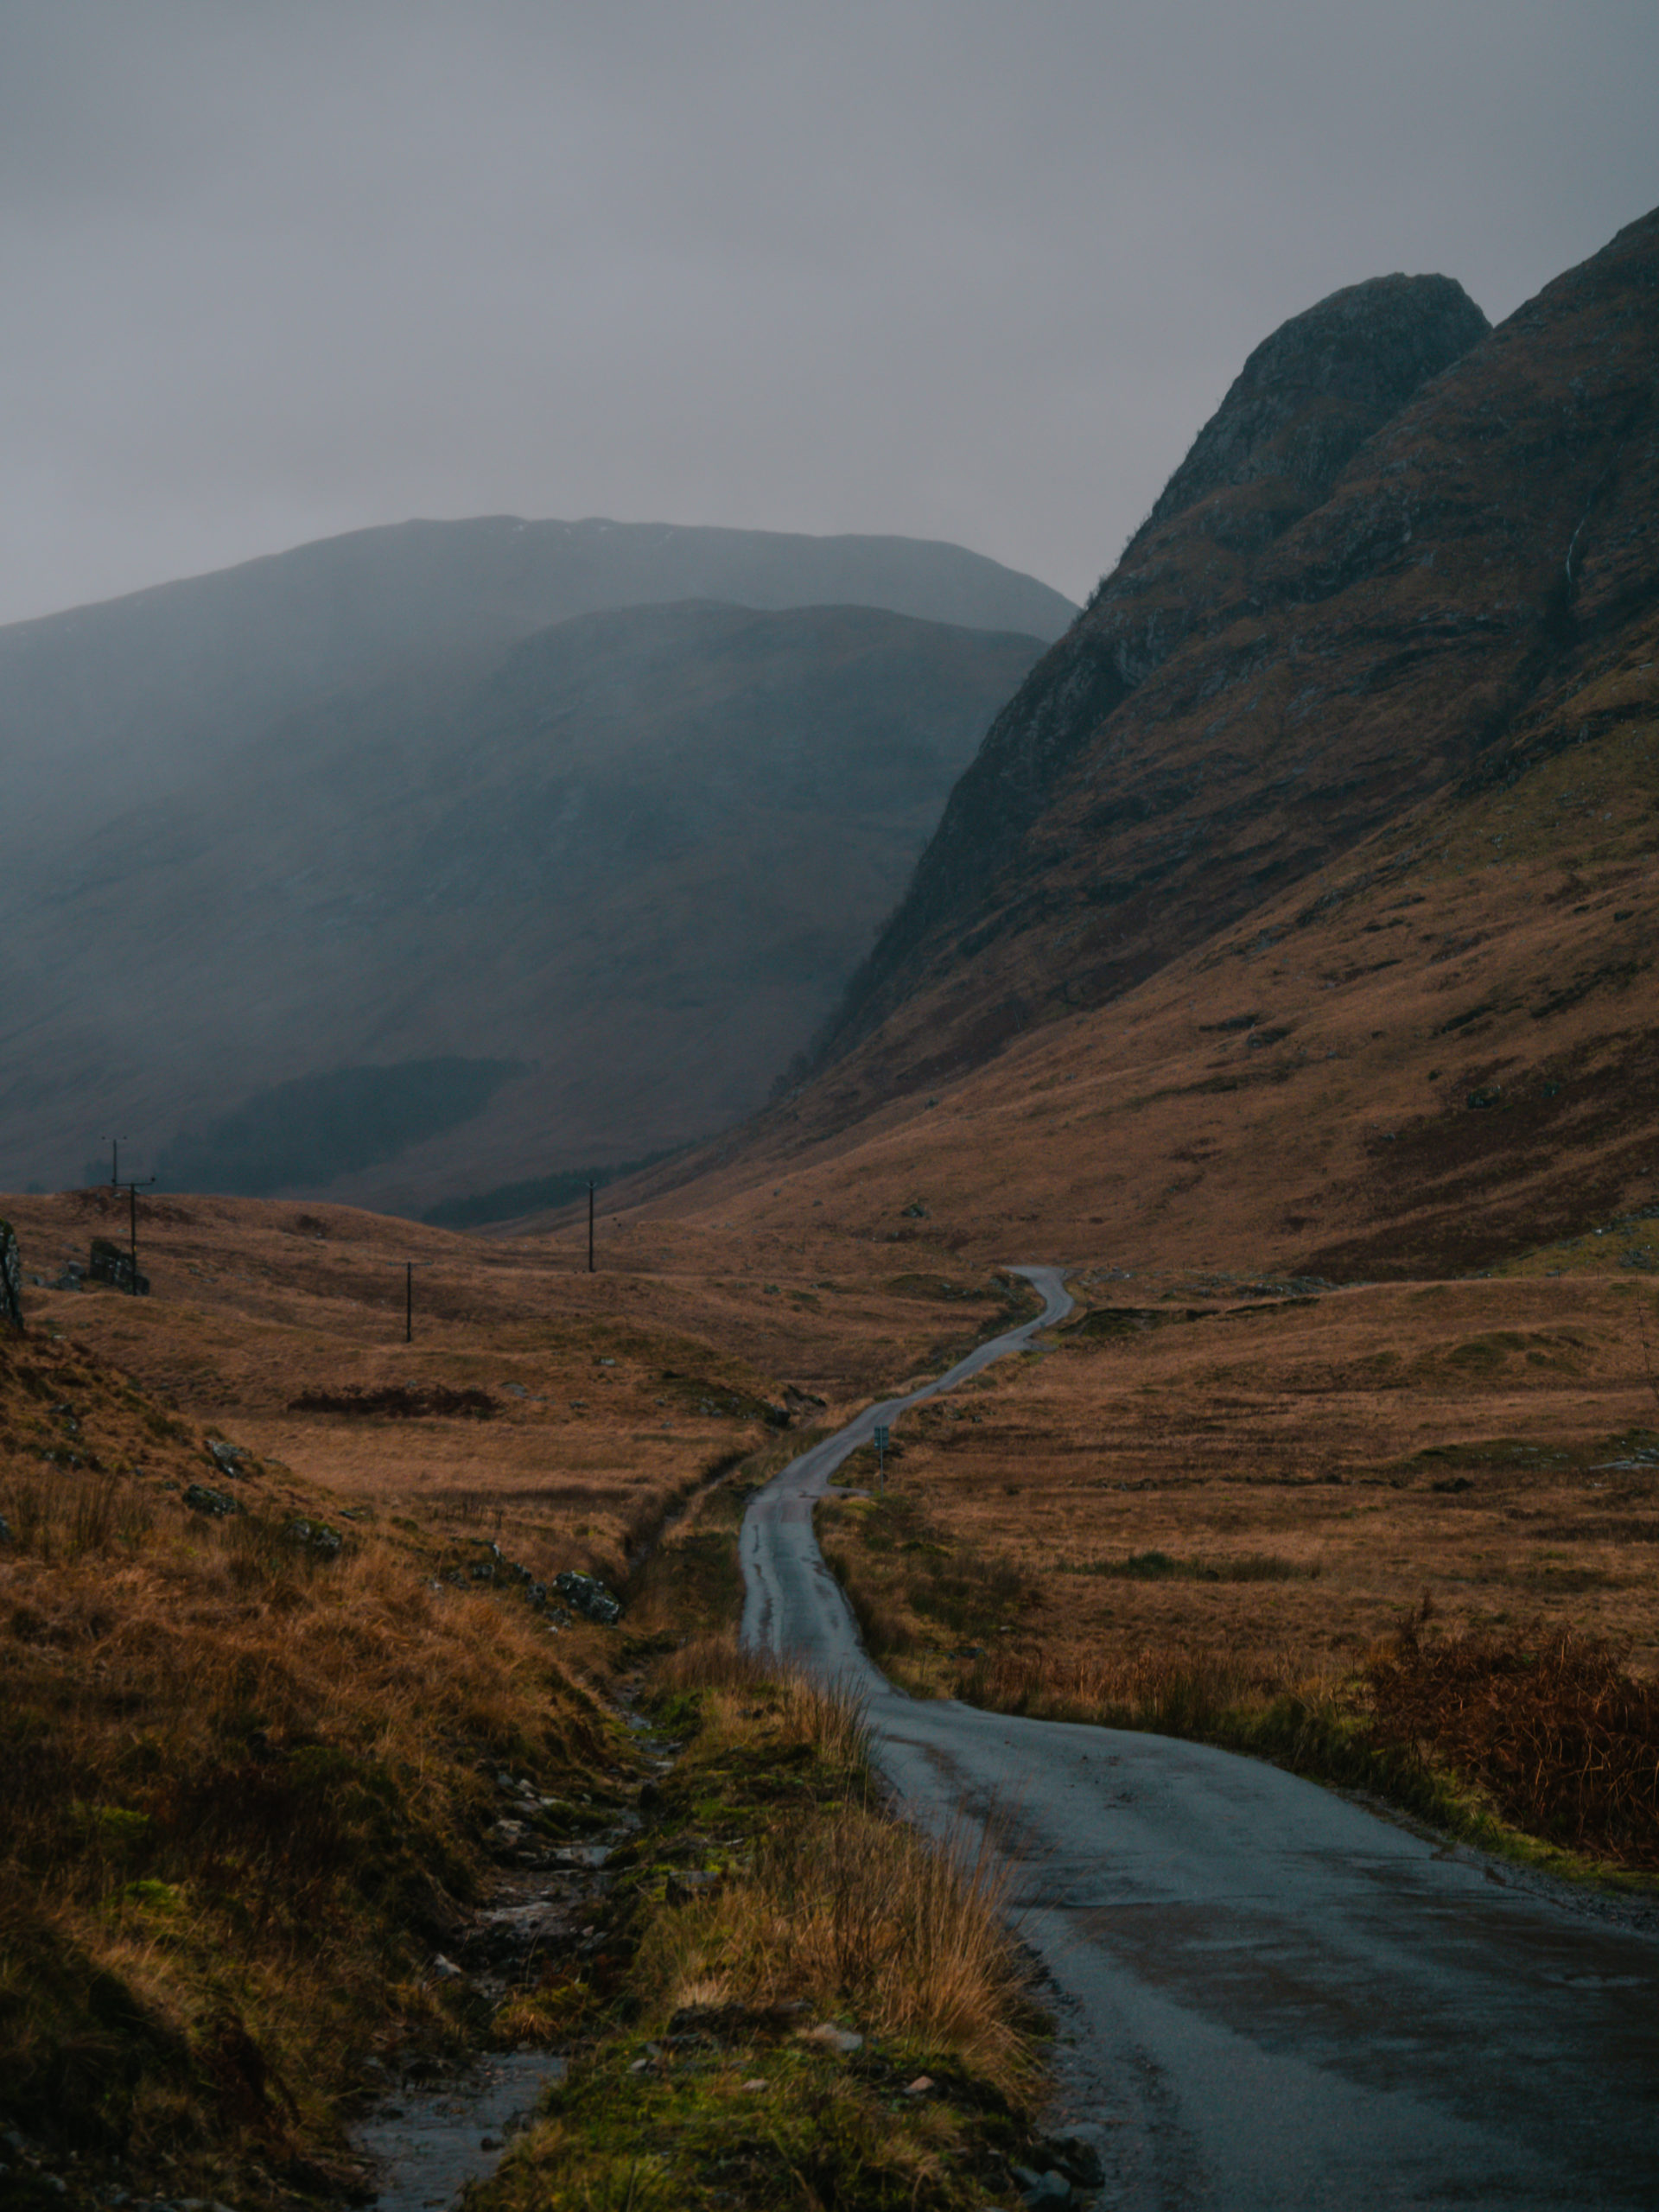 glencoe glen etive road trip route montagne écosse